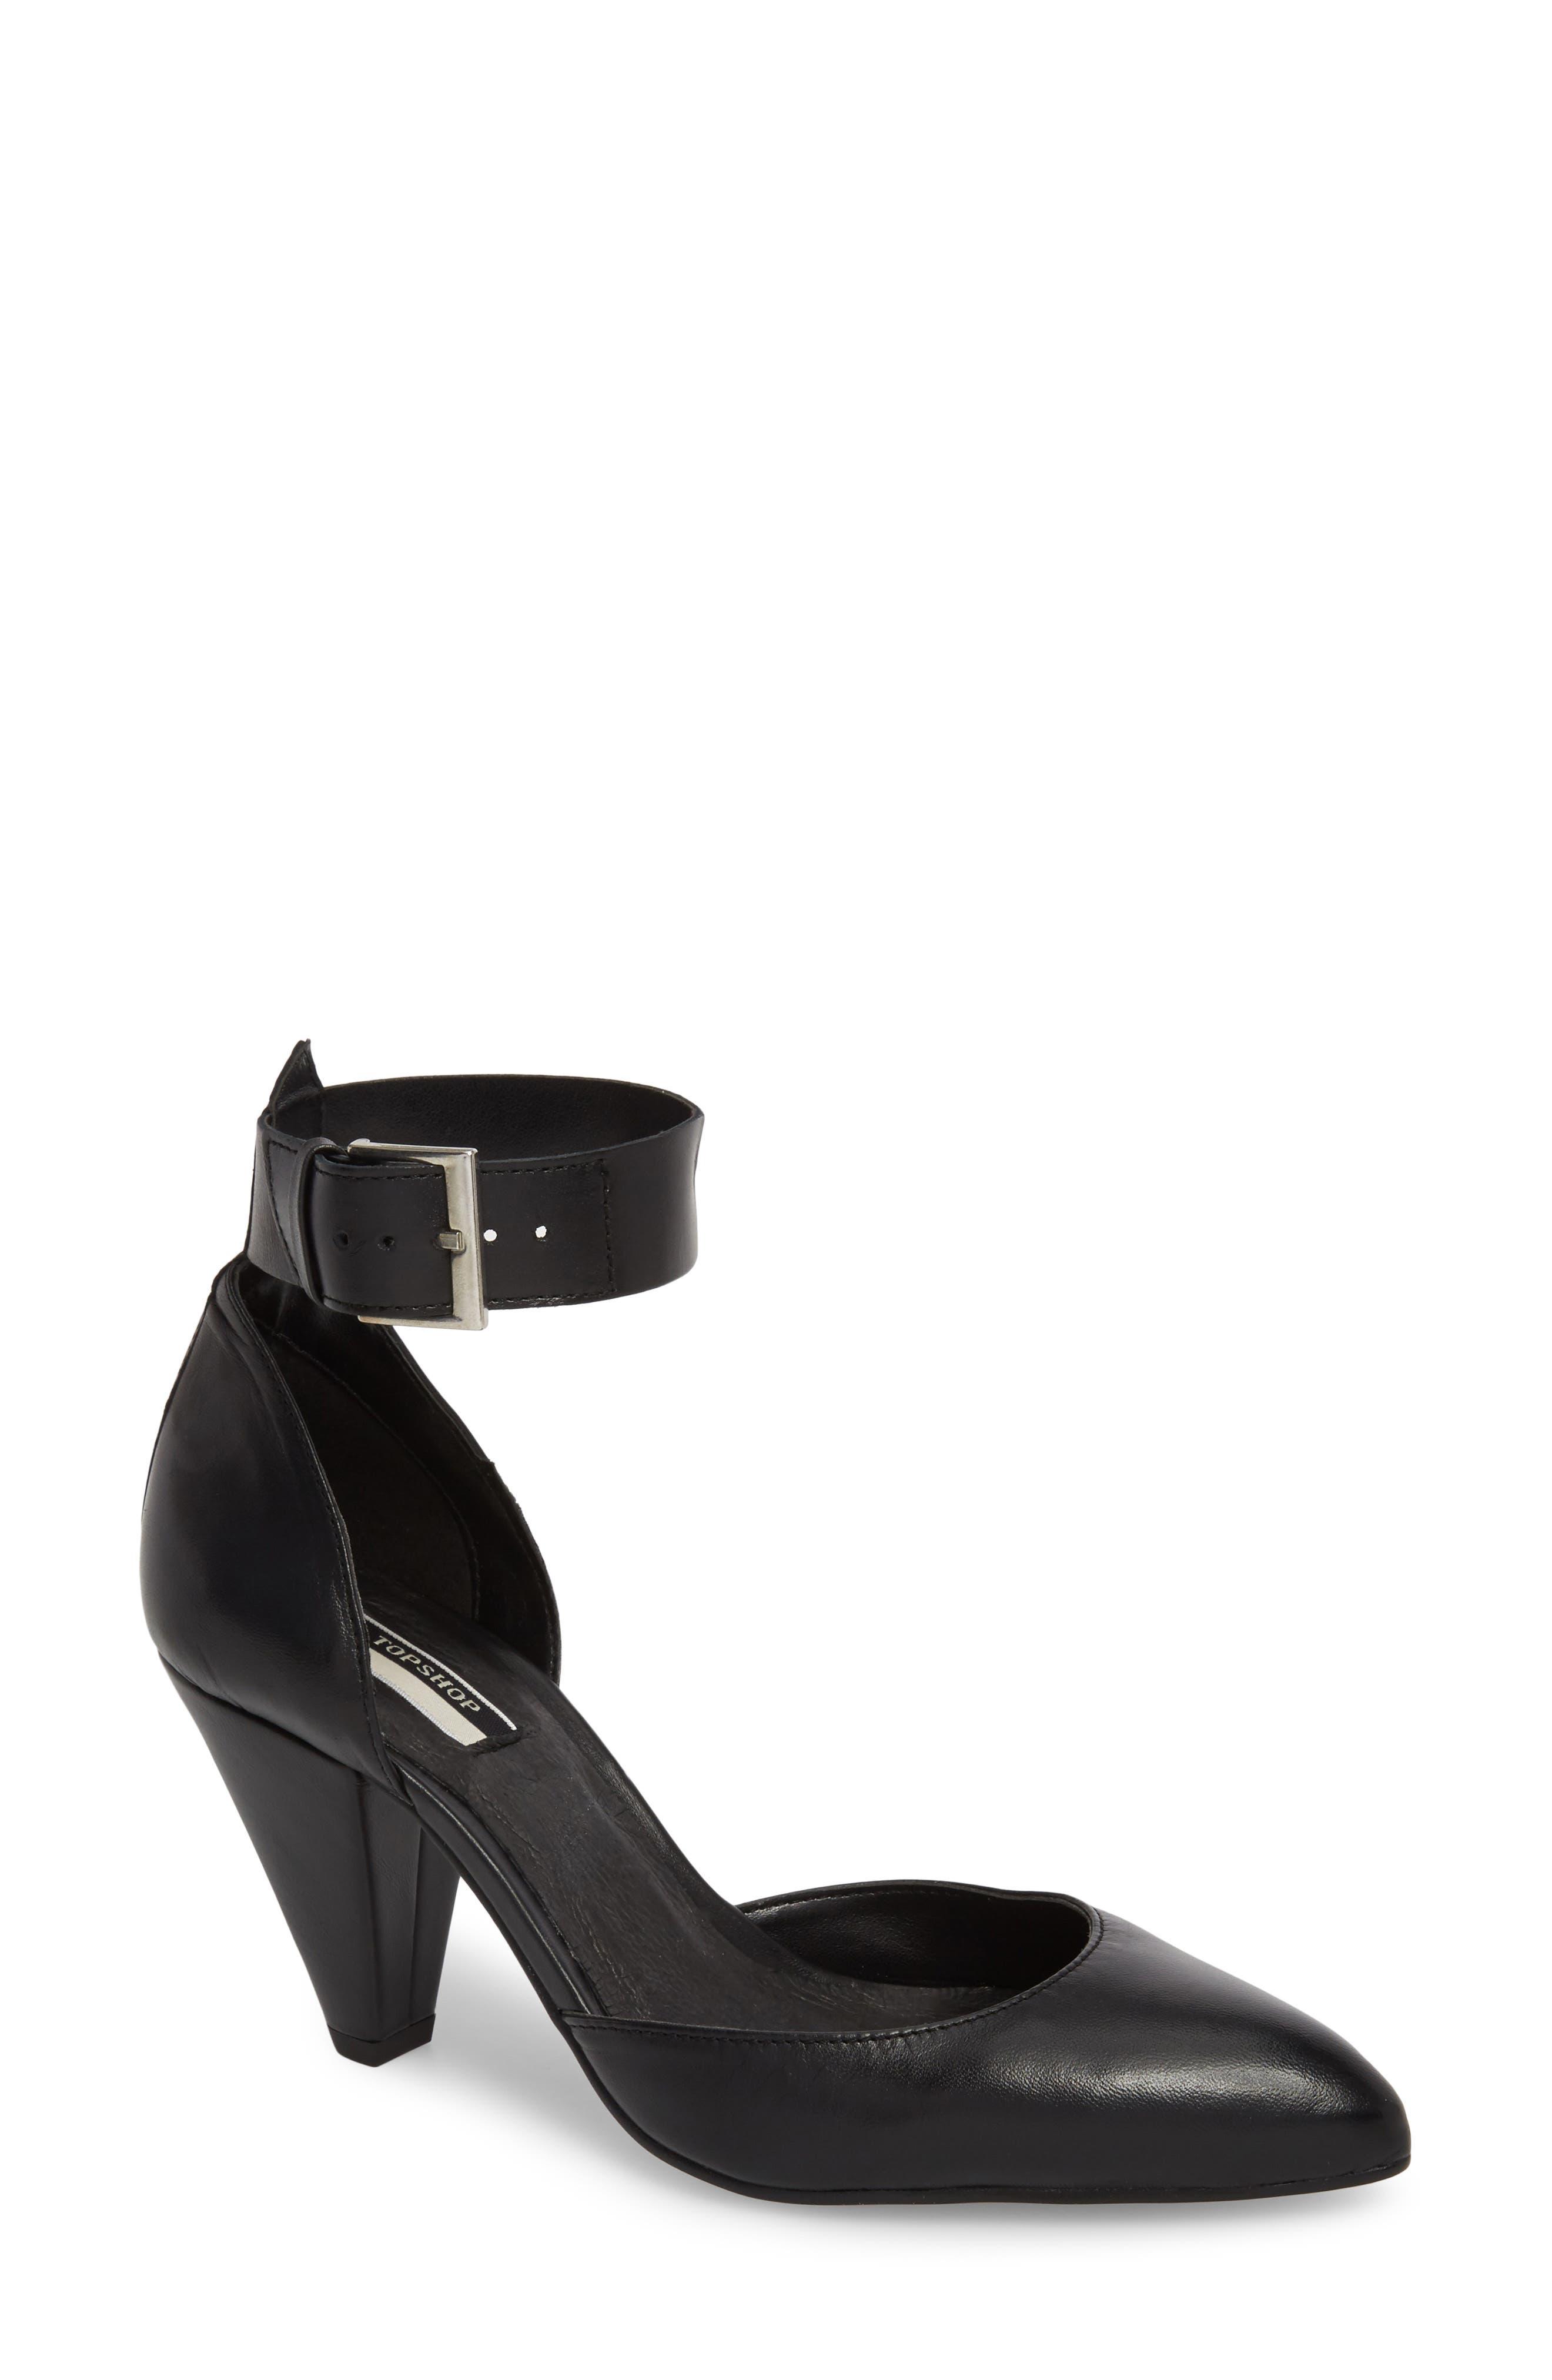 Jazzie Ankle Strap d'Orsay Pump,                         Main,                         color, Black